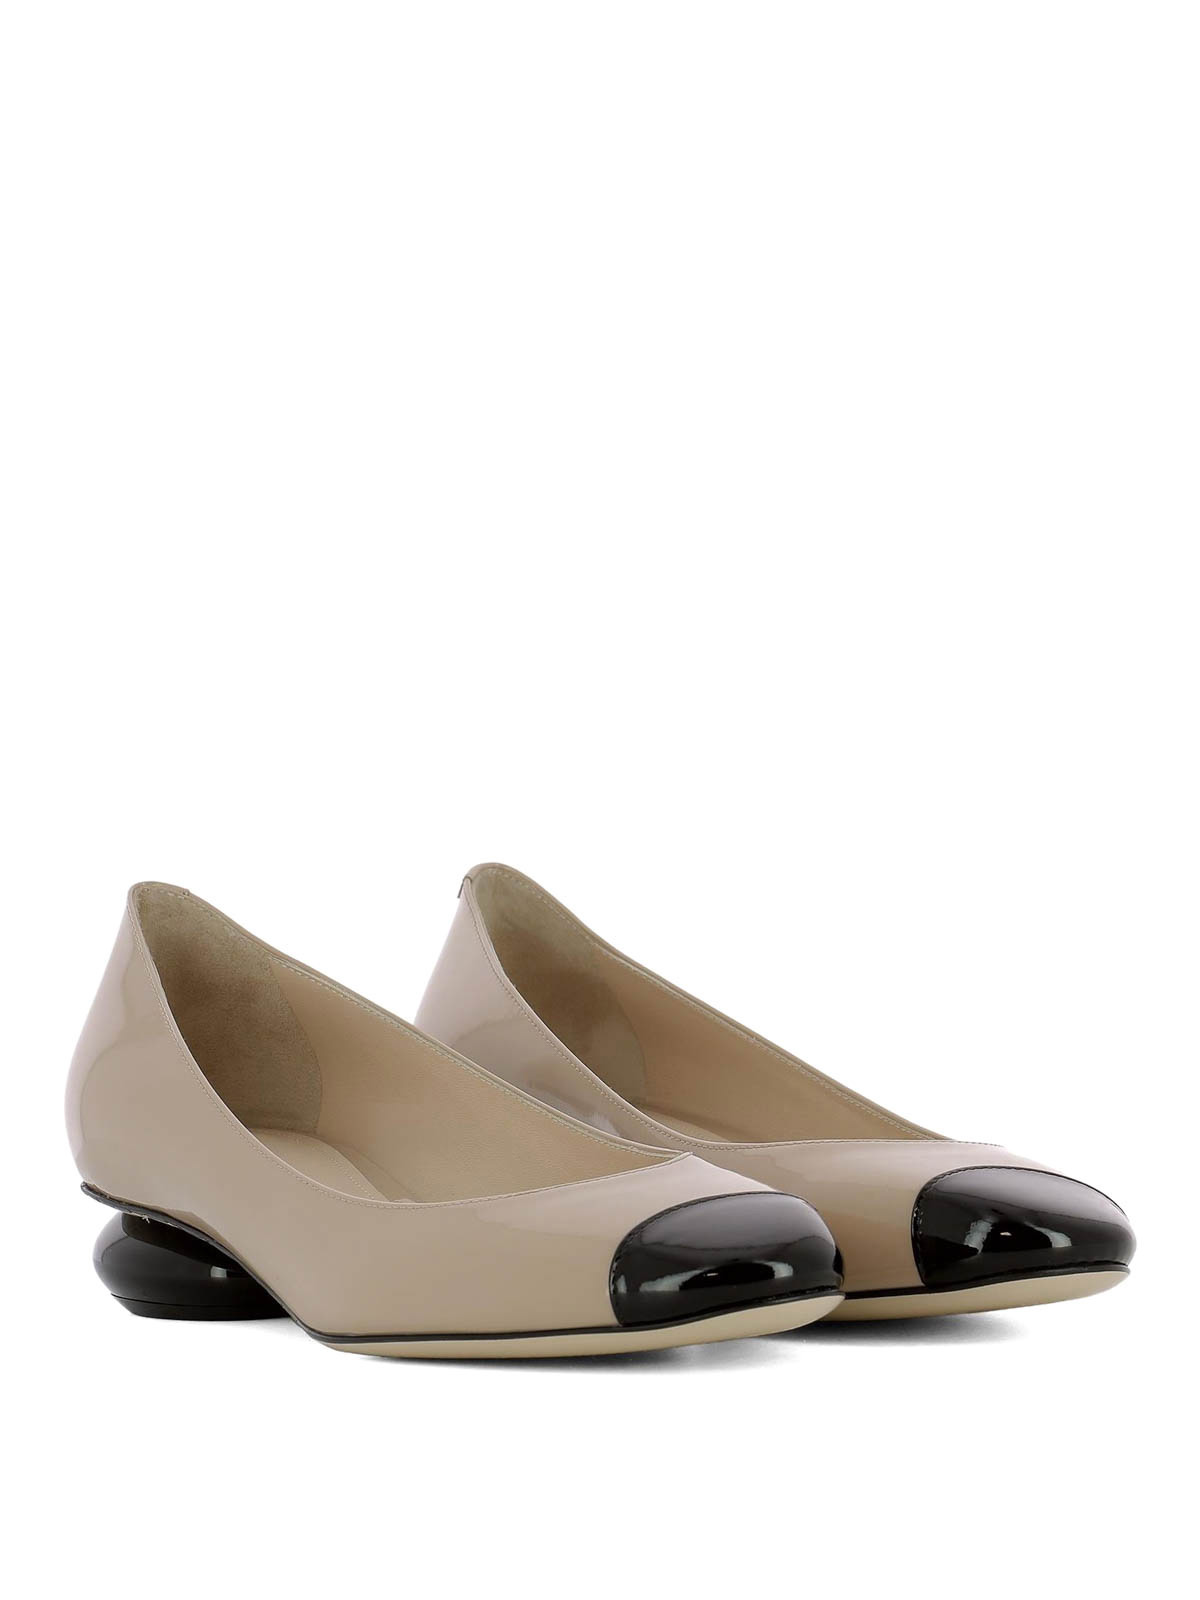 Chaussures - Courts Bottega Veneta mio3aek